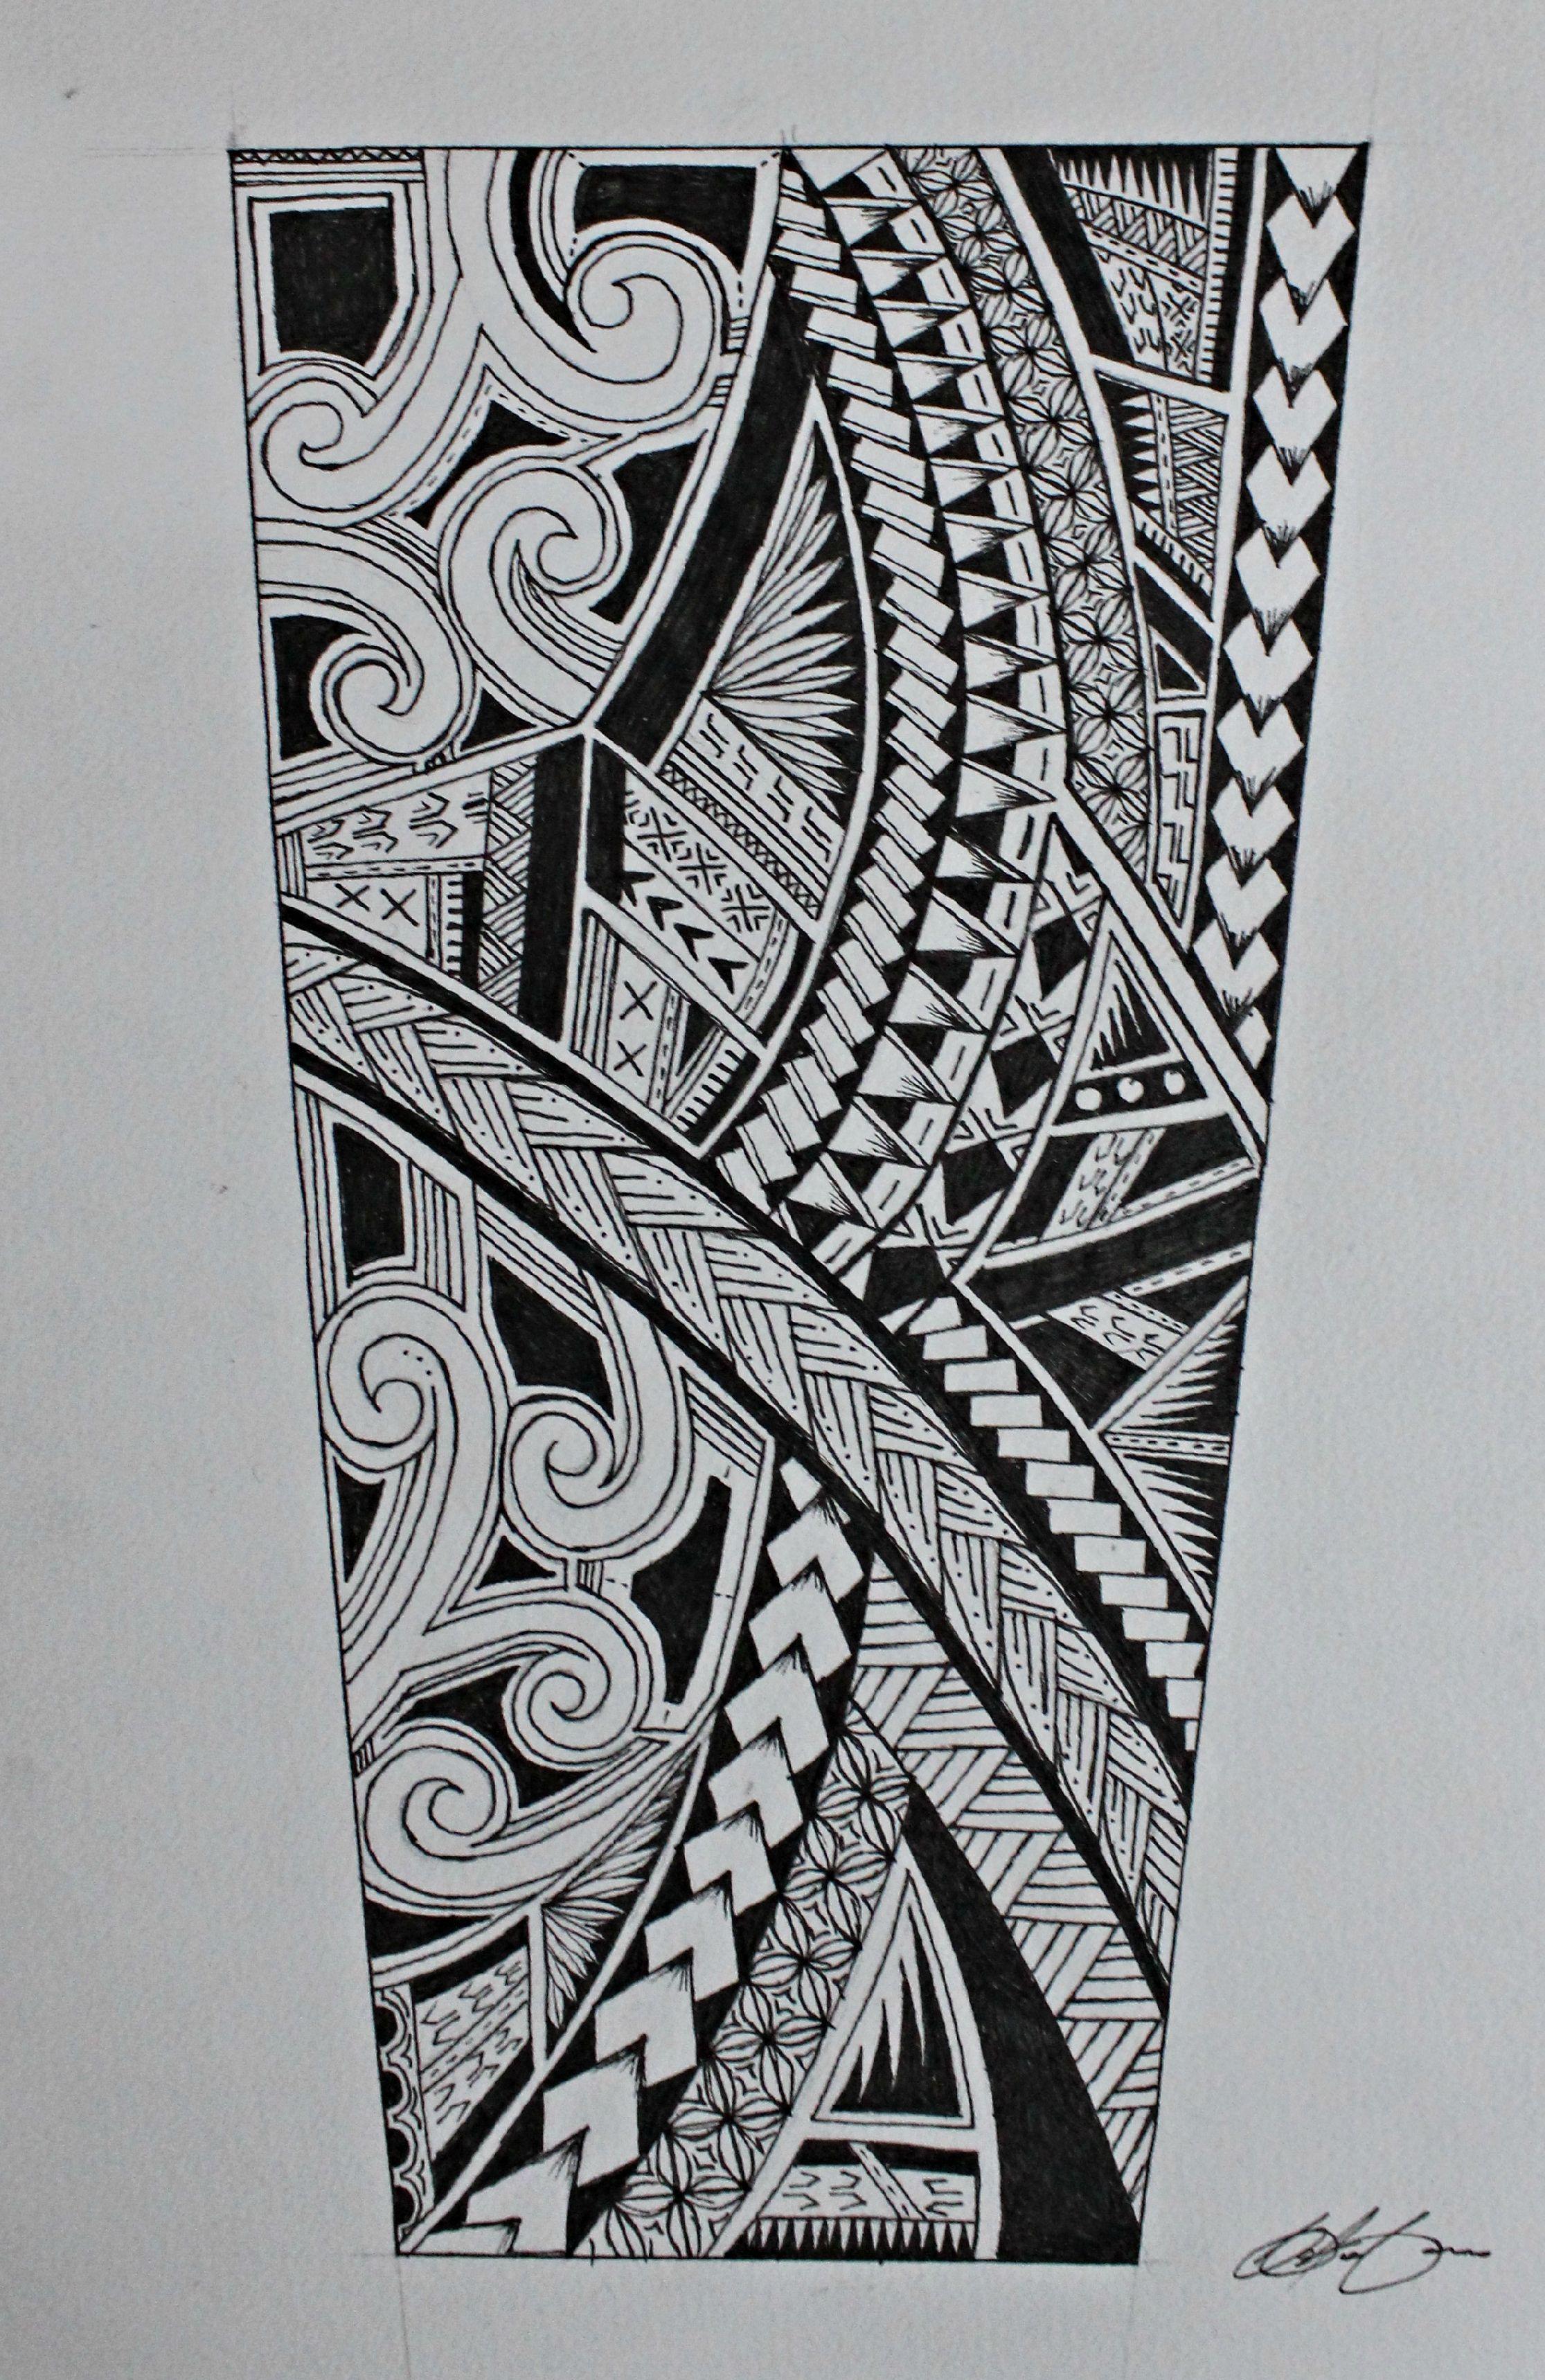 Forearm Tattoo Desenhos De Tatuagem Maori Maori E Tatuagem Samoana